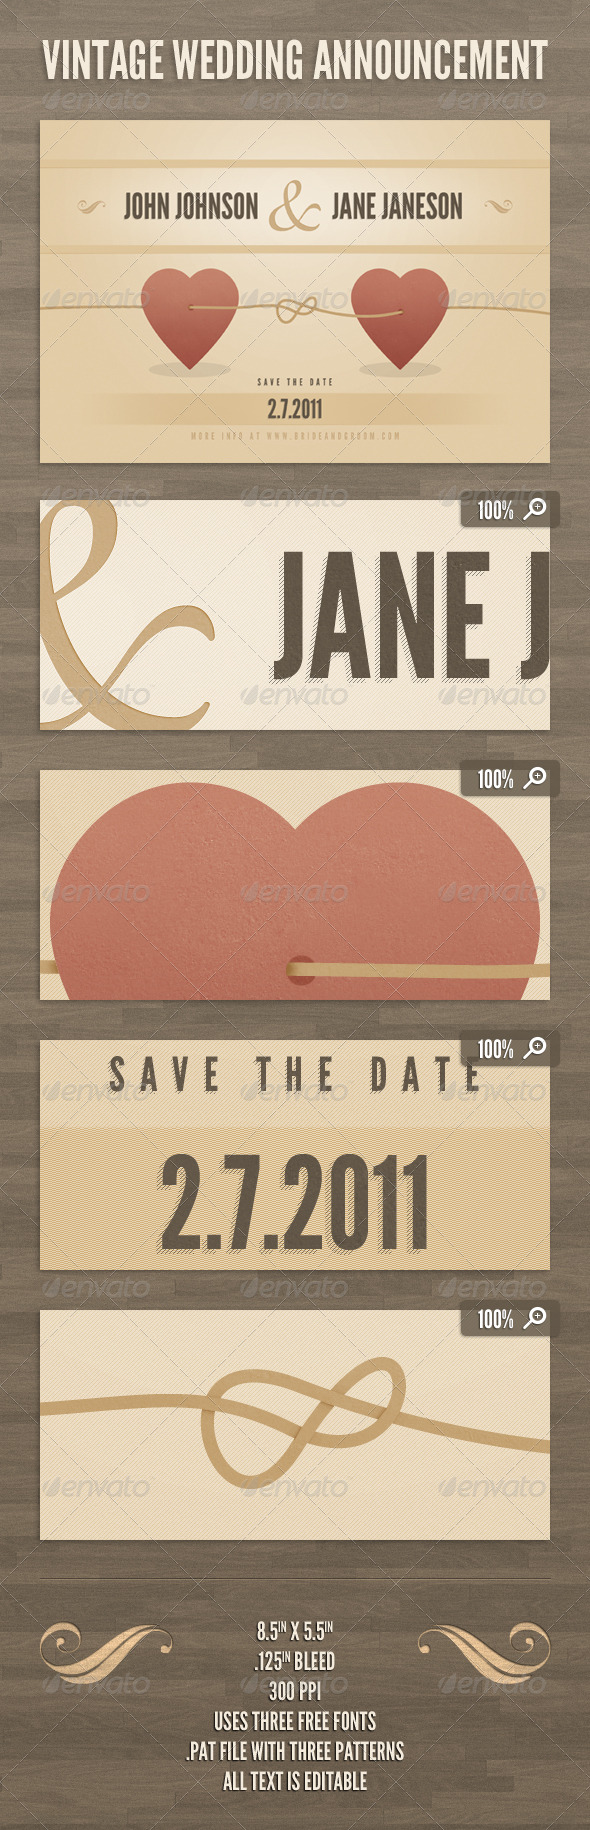 Vintage Wedding Announcement Template - Weddings Cards & Invites